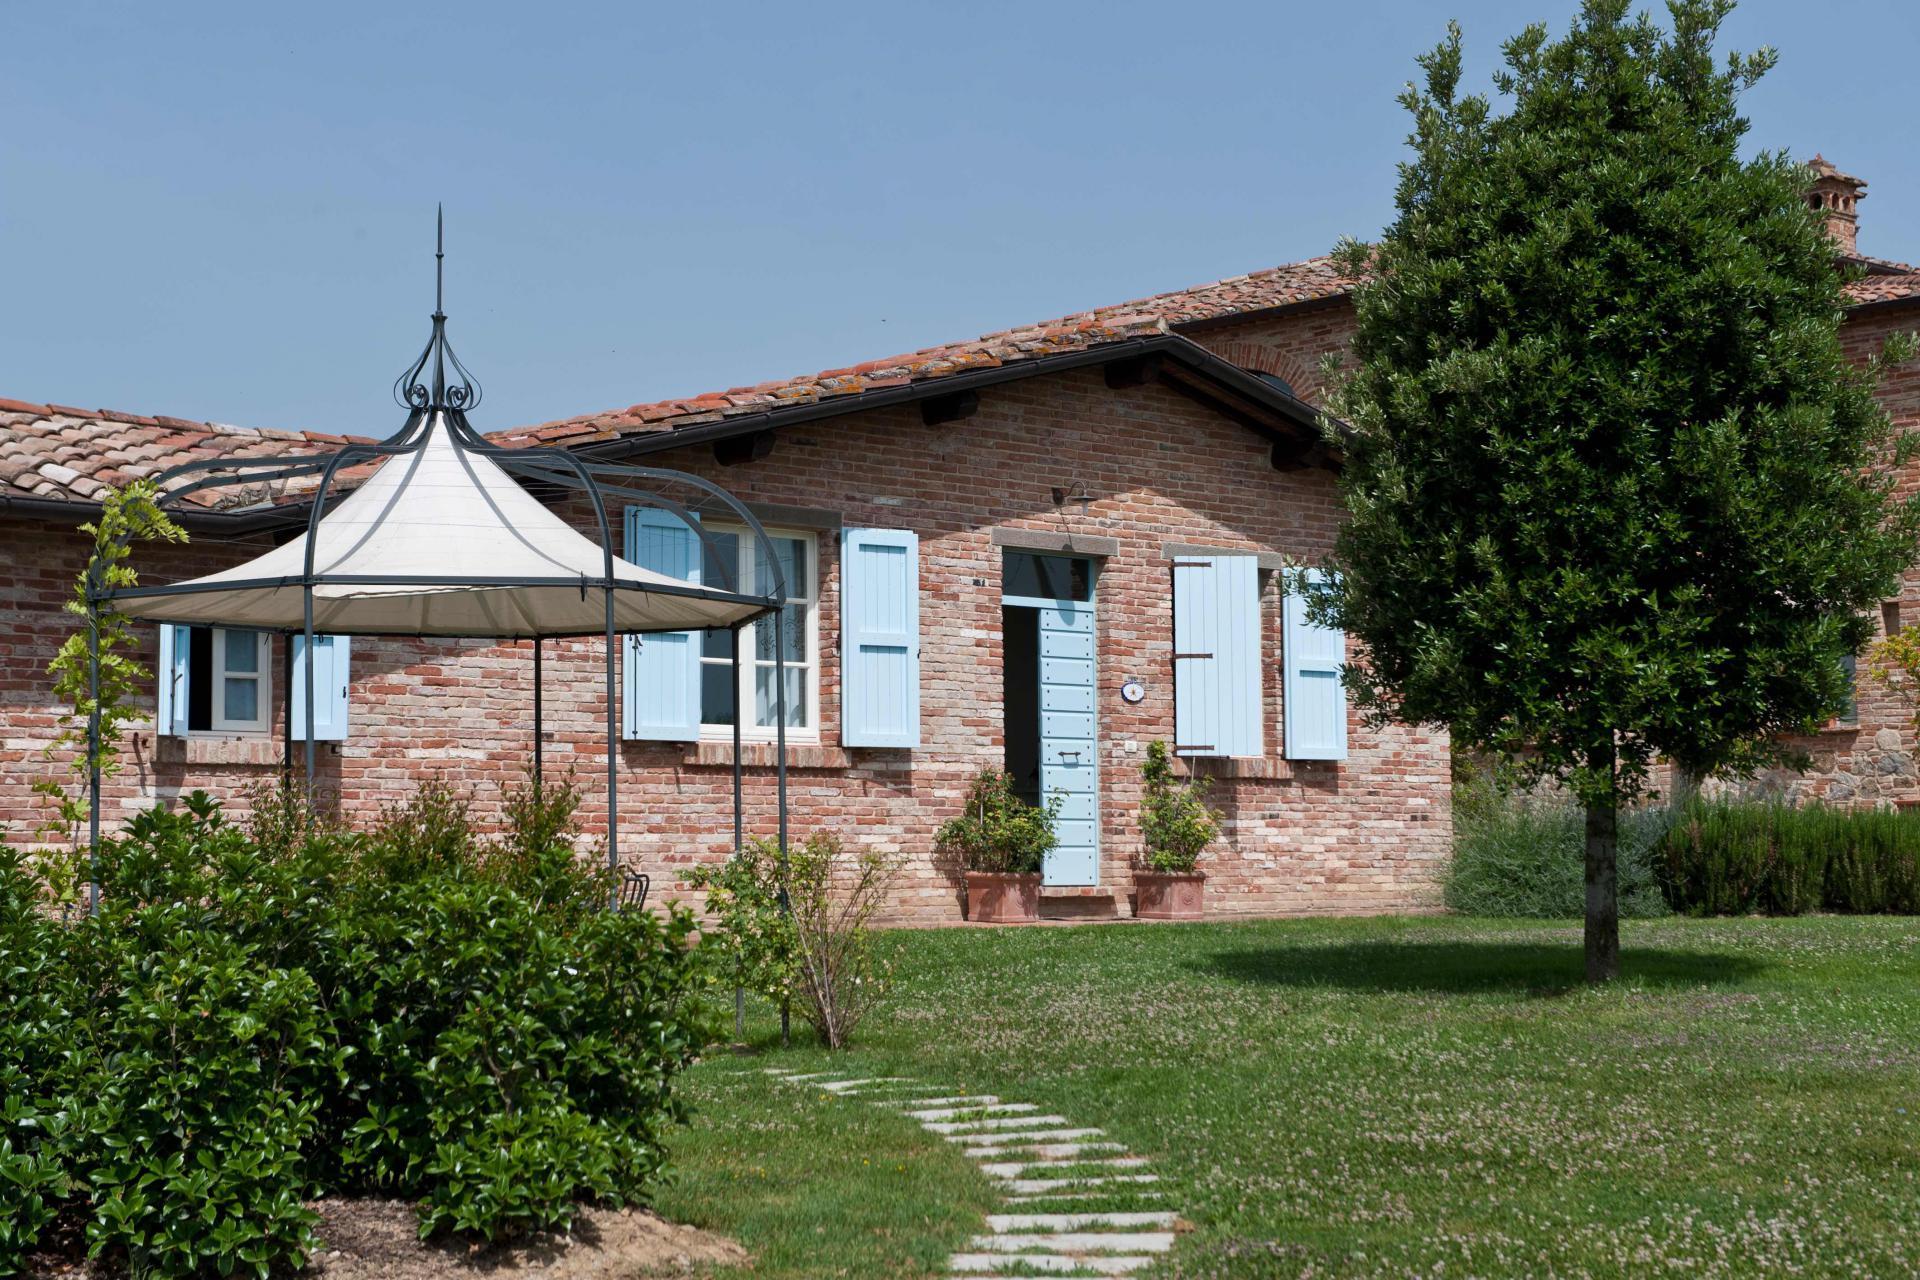 Agriturismo Toscane Agriturismo nabij Arezzo  – heerlijk relaxen | myitaly.nl